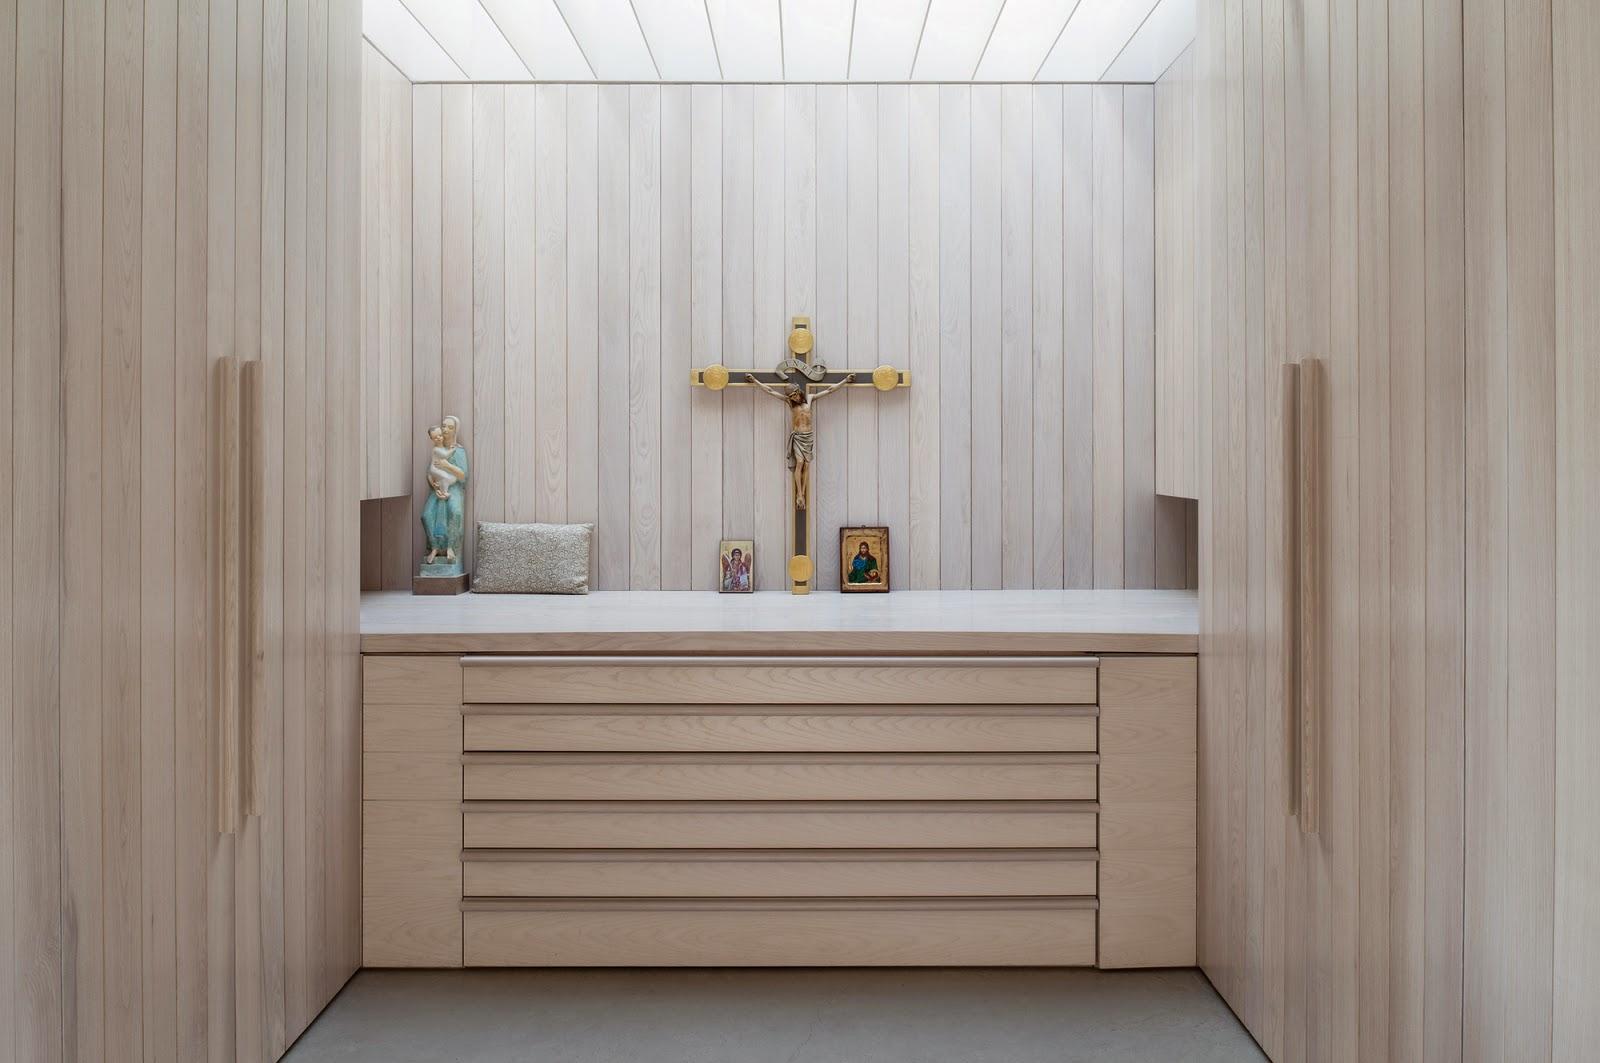 ALBERTA NORWEG: Capilla Obispo Edward King / Niall McLaughlin Architects